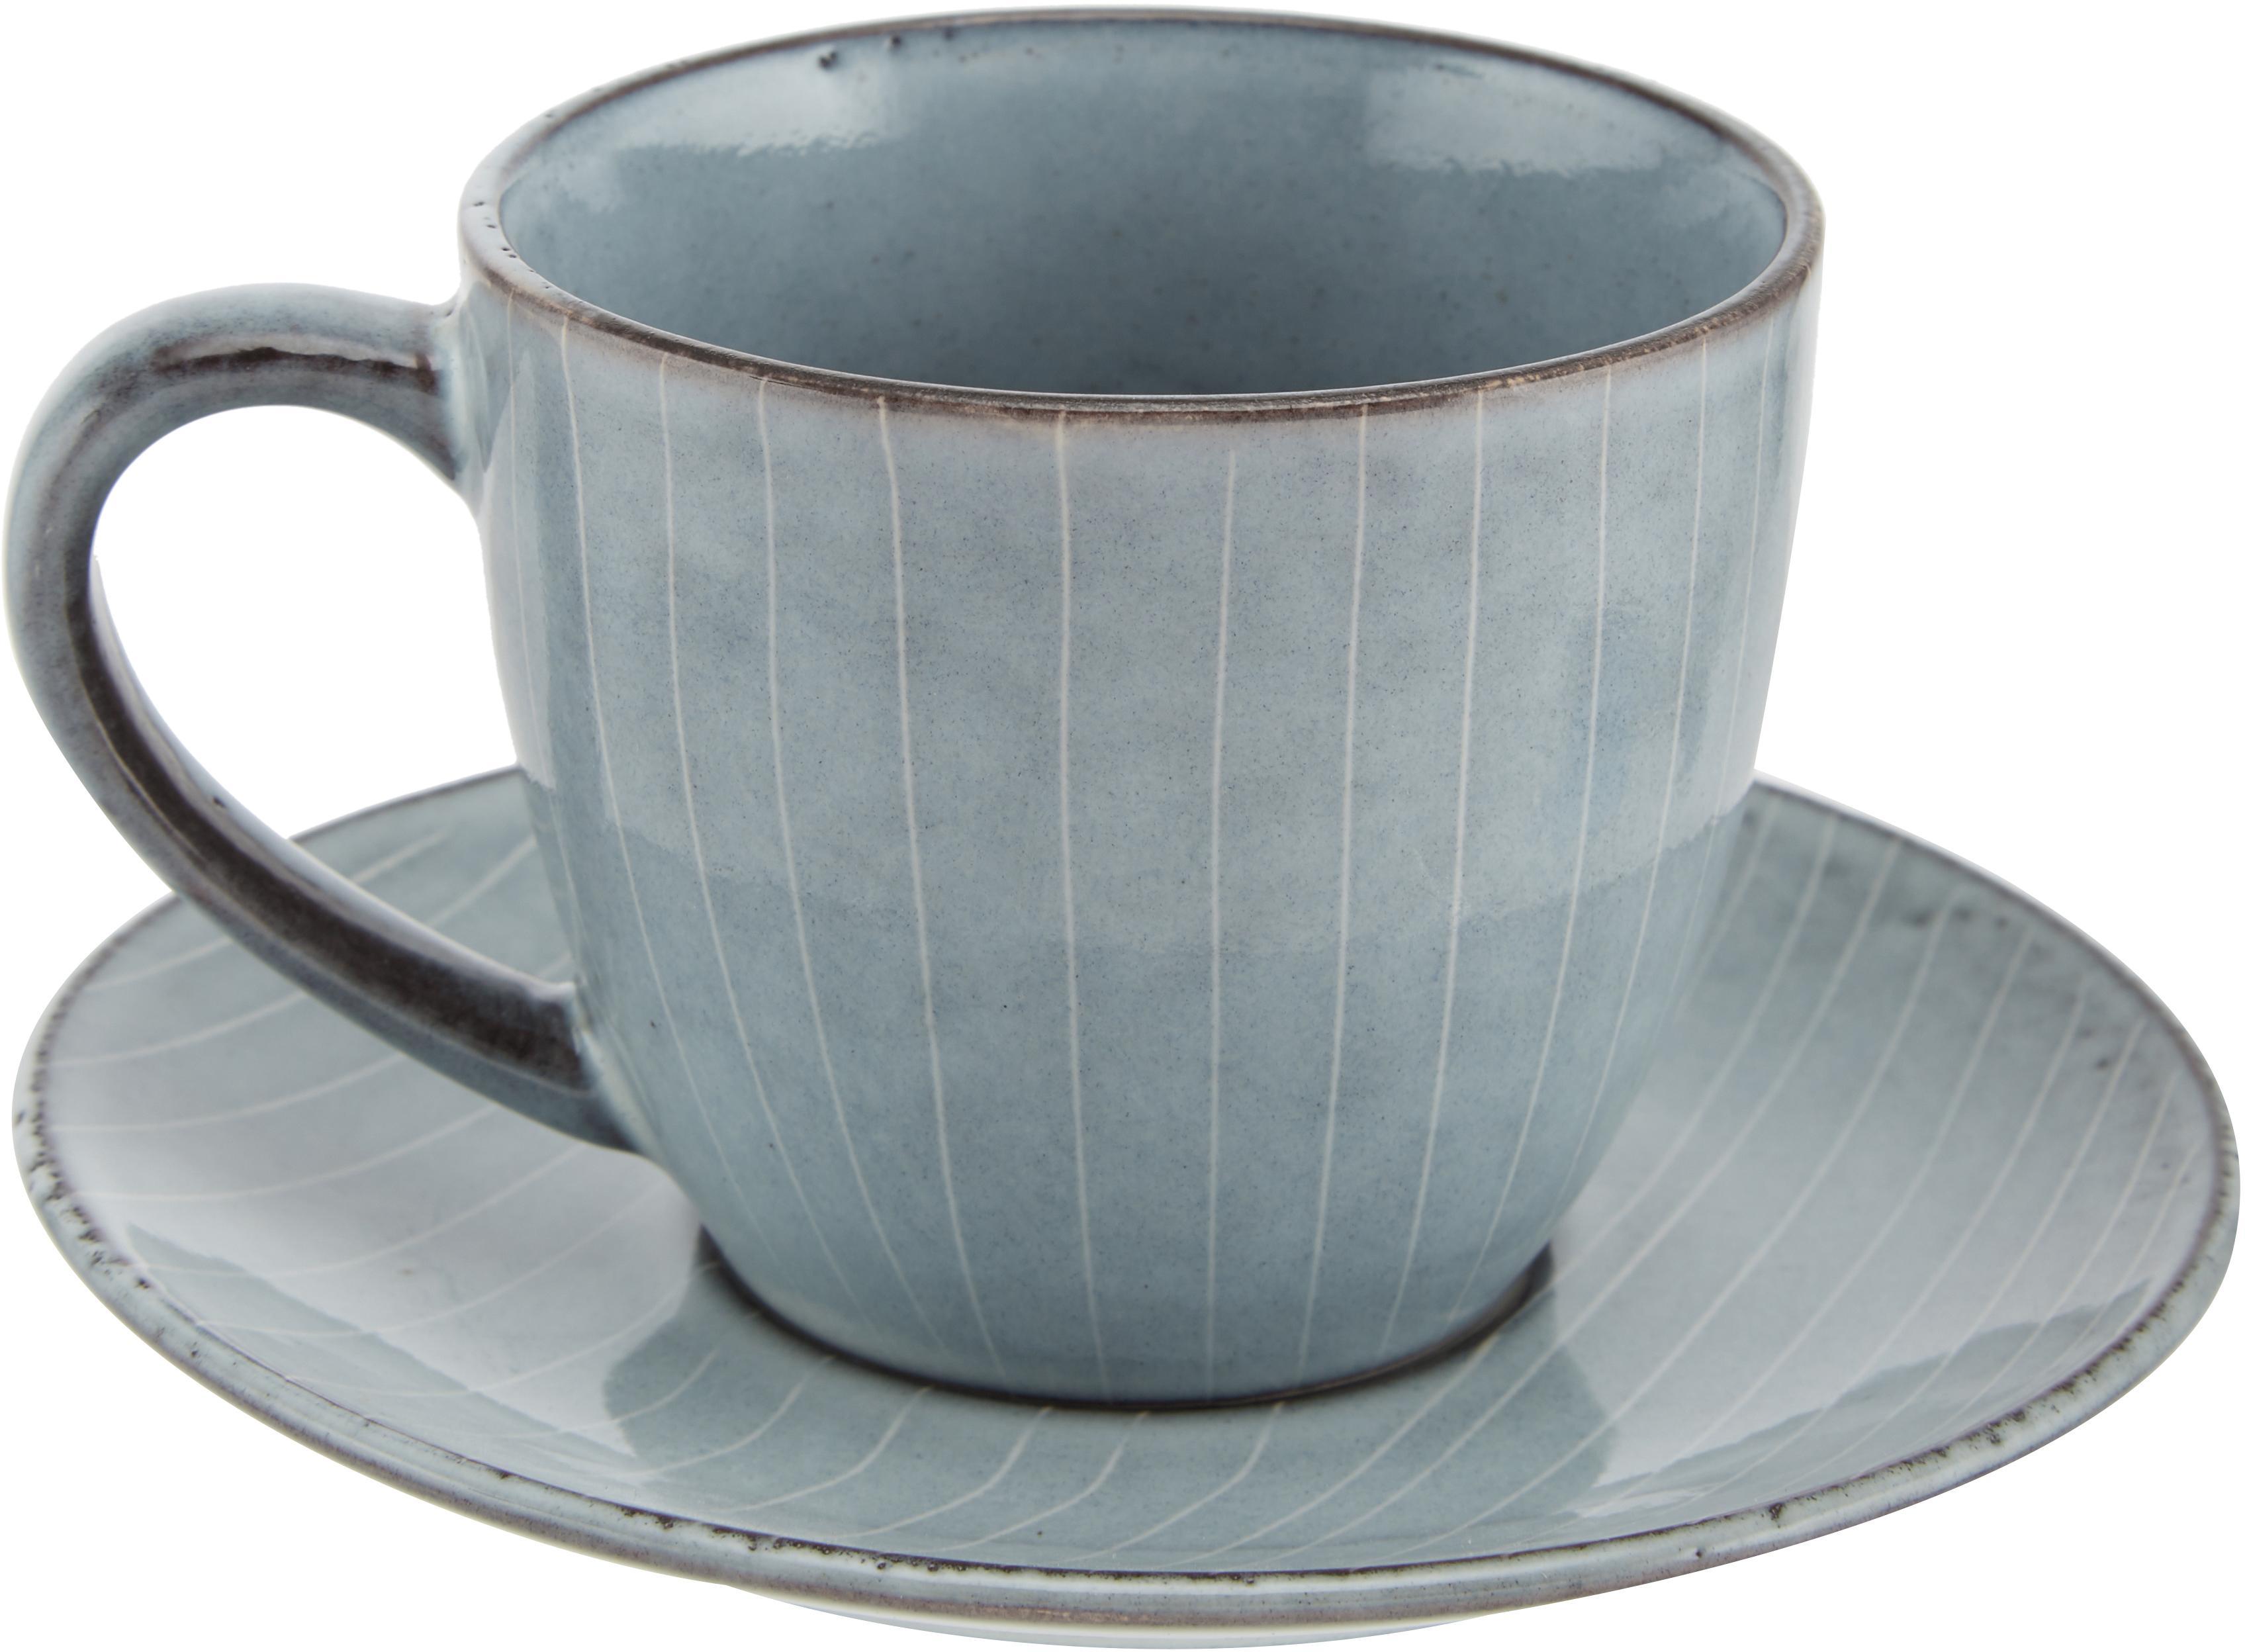 Taza artesanal Nordic Sea, 2pzas., Gres, Tonos grises y azules, Ø 14 x Al 9 cm